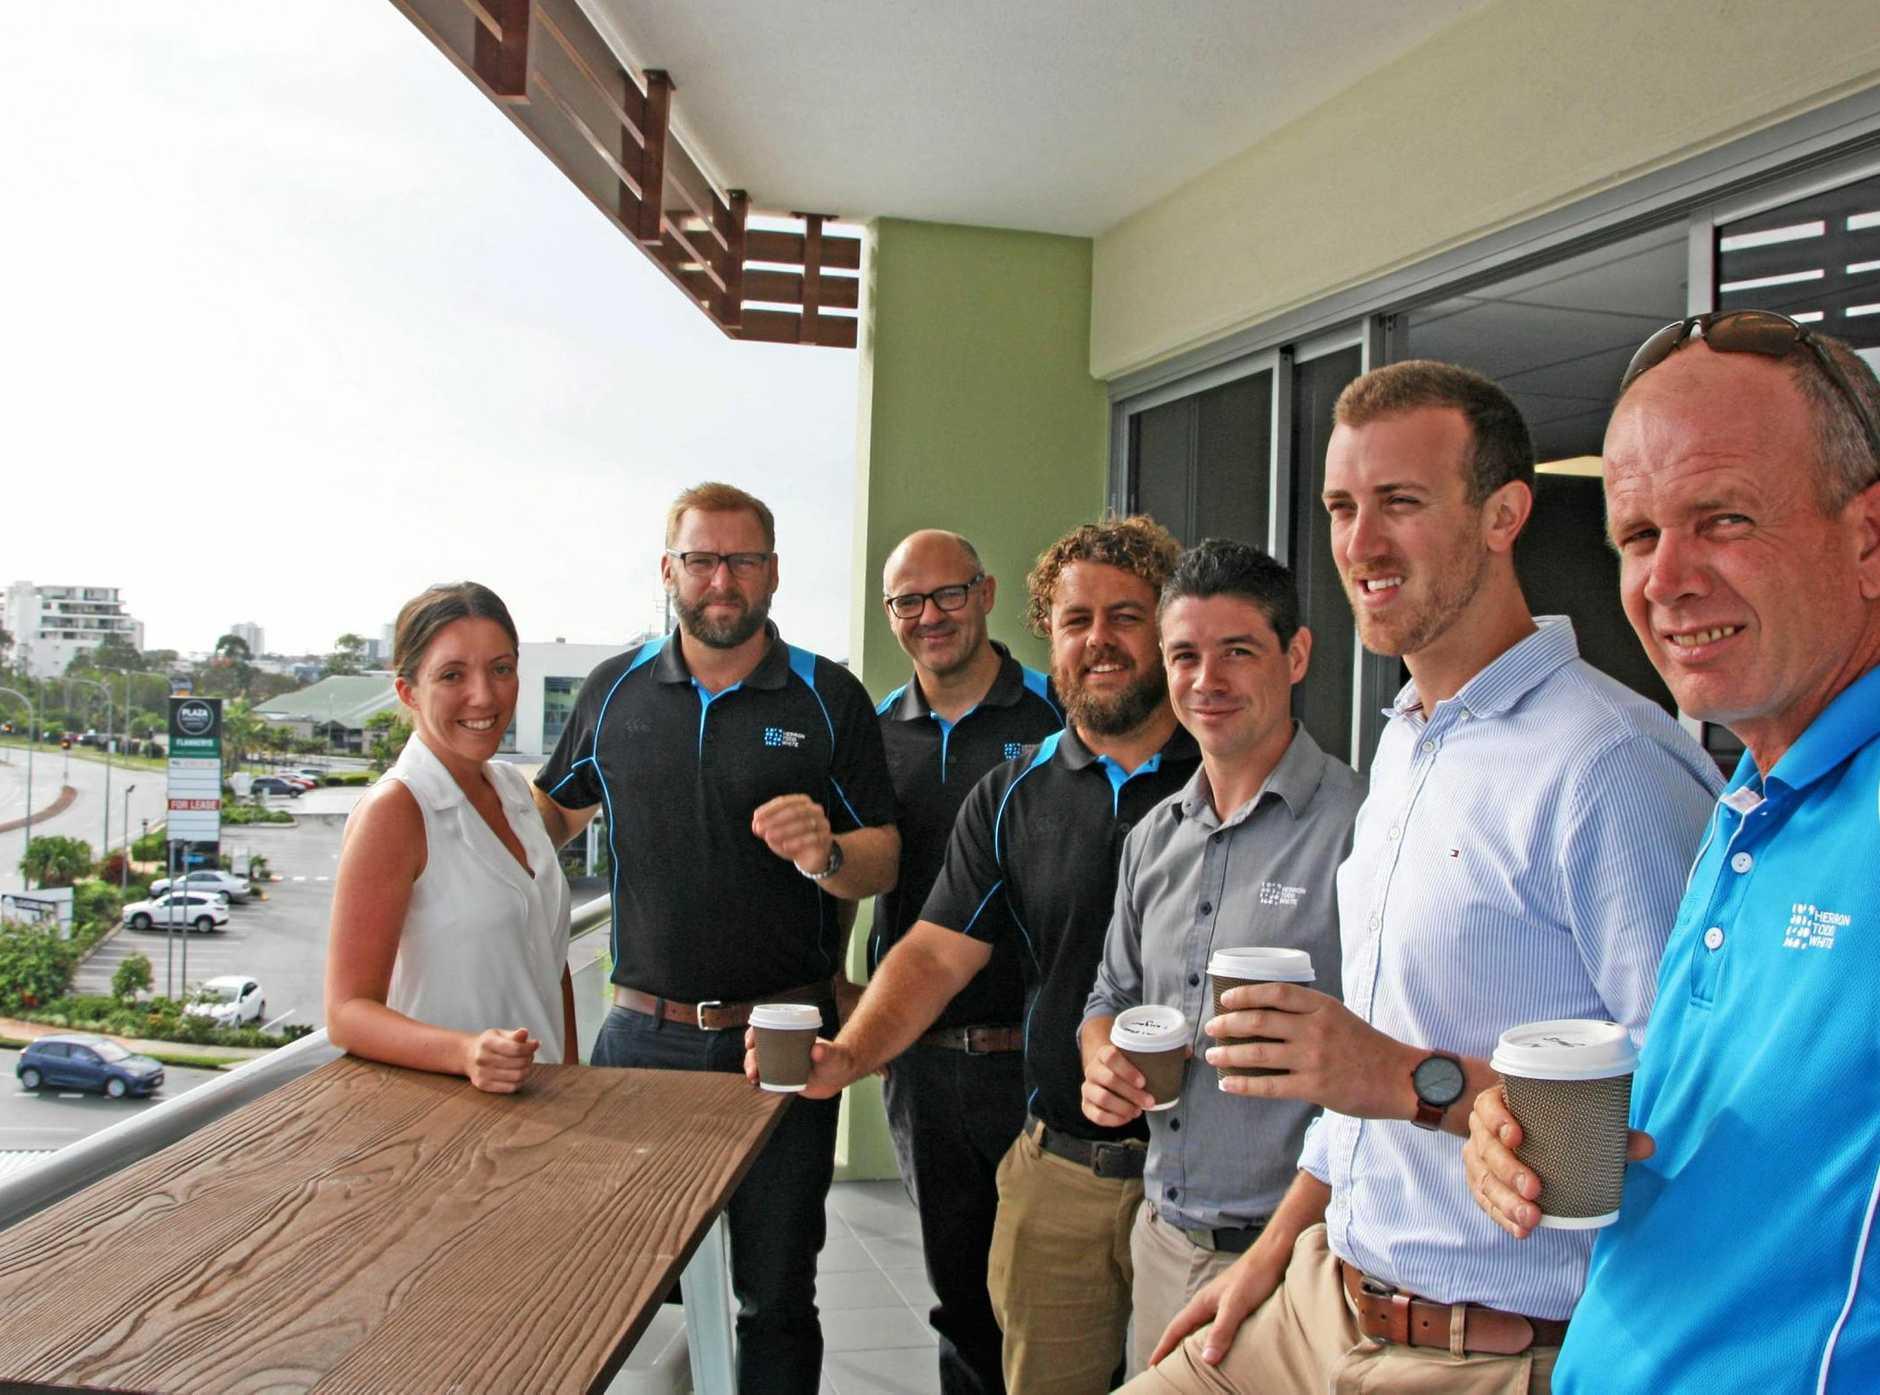 HTW Sunshine Coast move into their new premises at Plaza Pde, Maroochydore.